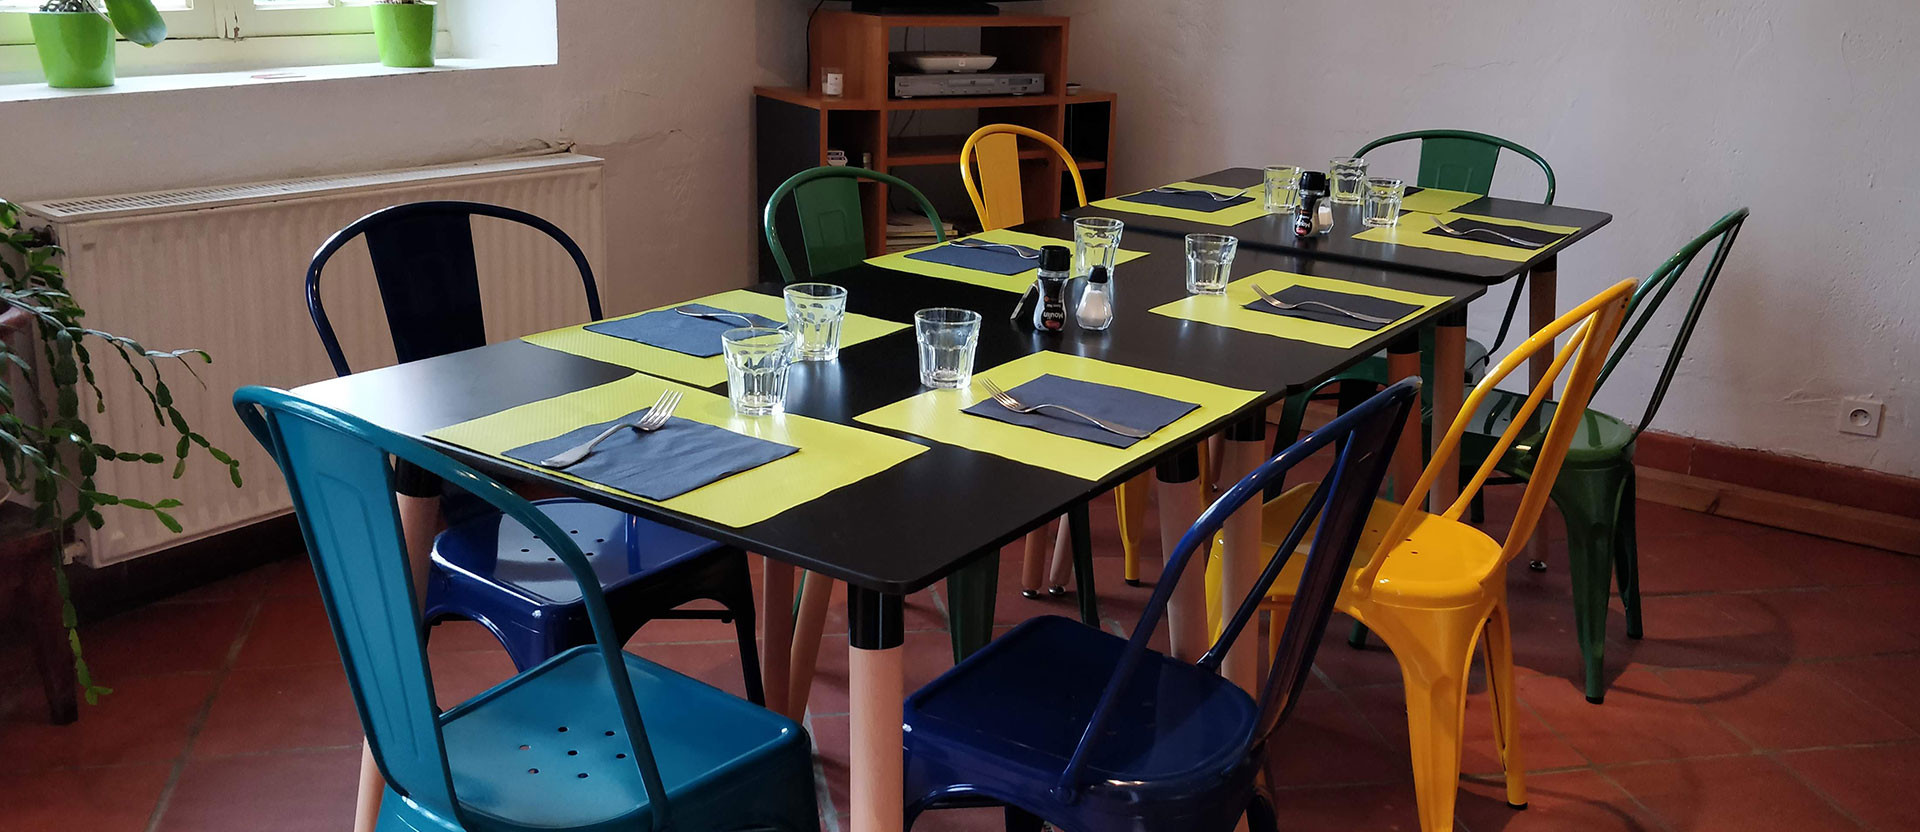 Table_Golf_LasMartines.jpg